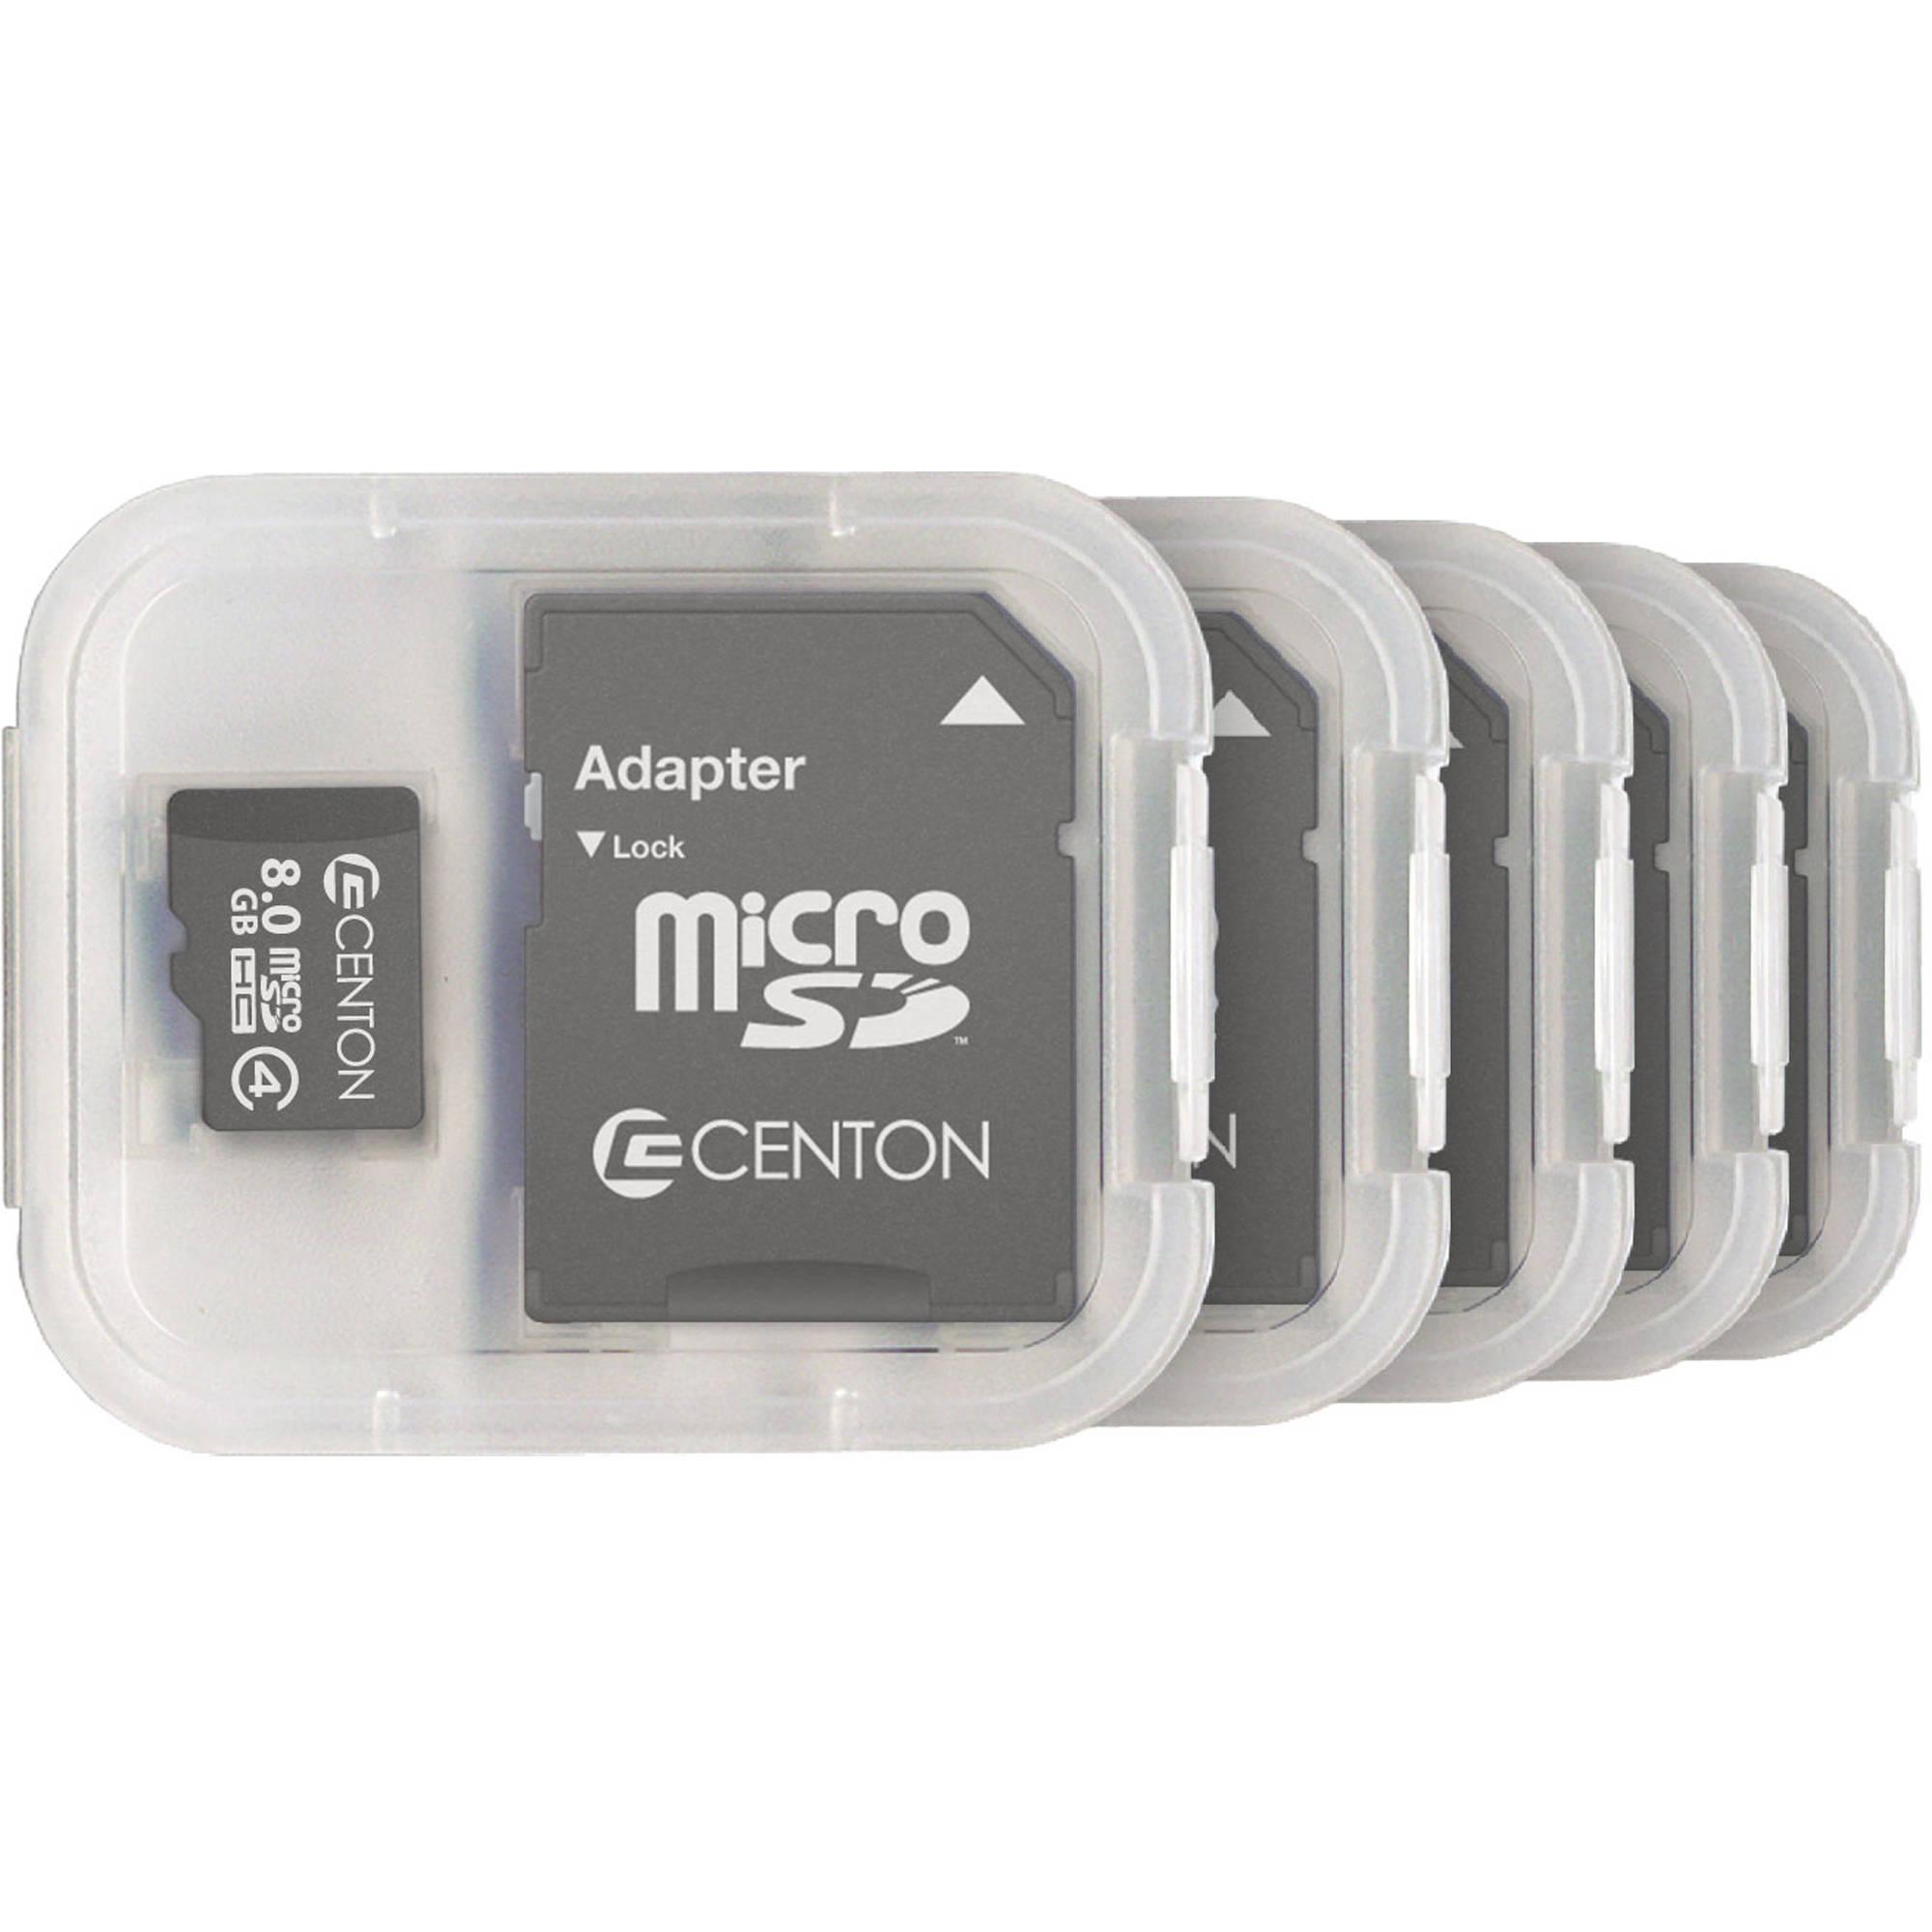 Centon MP Essential 8GB Class 4 microSDHC Card, 5pk